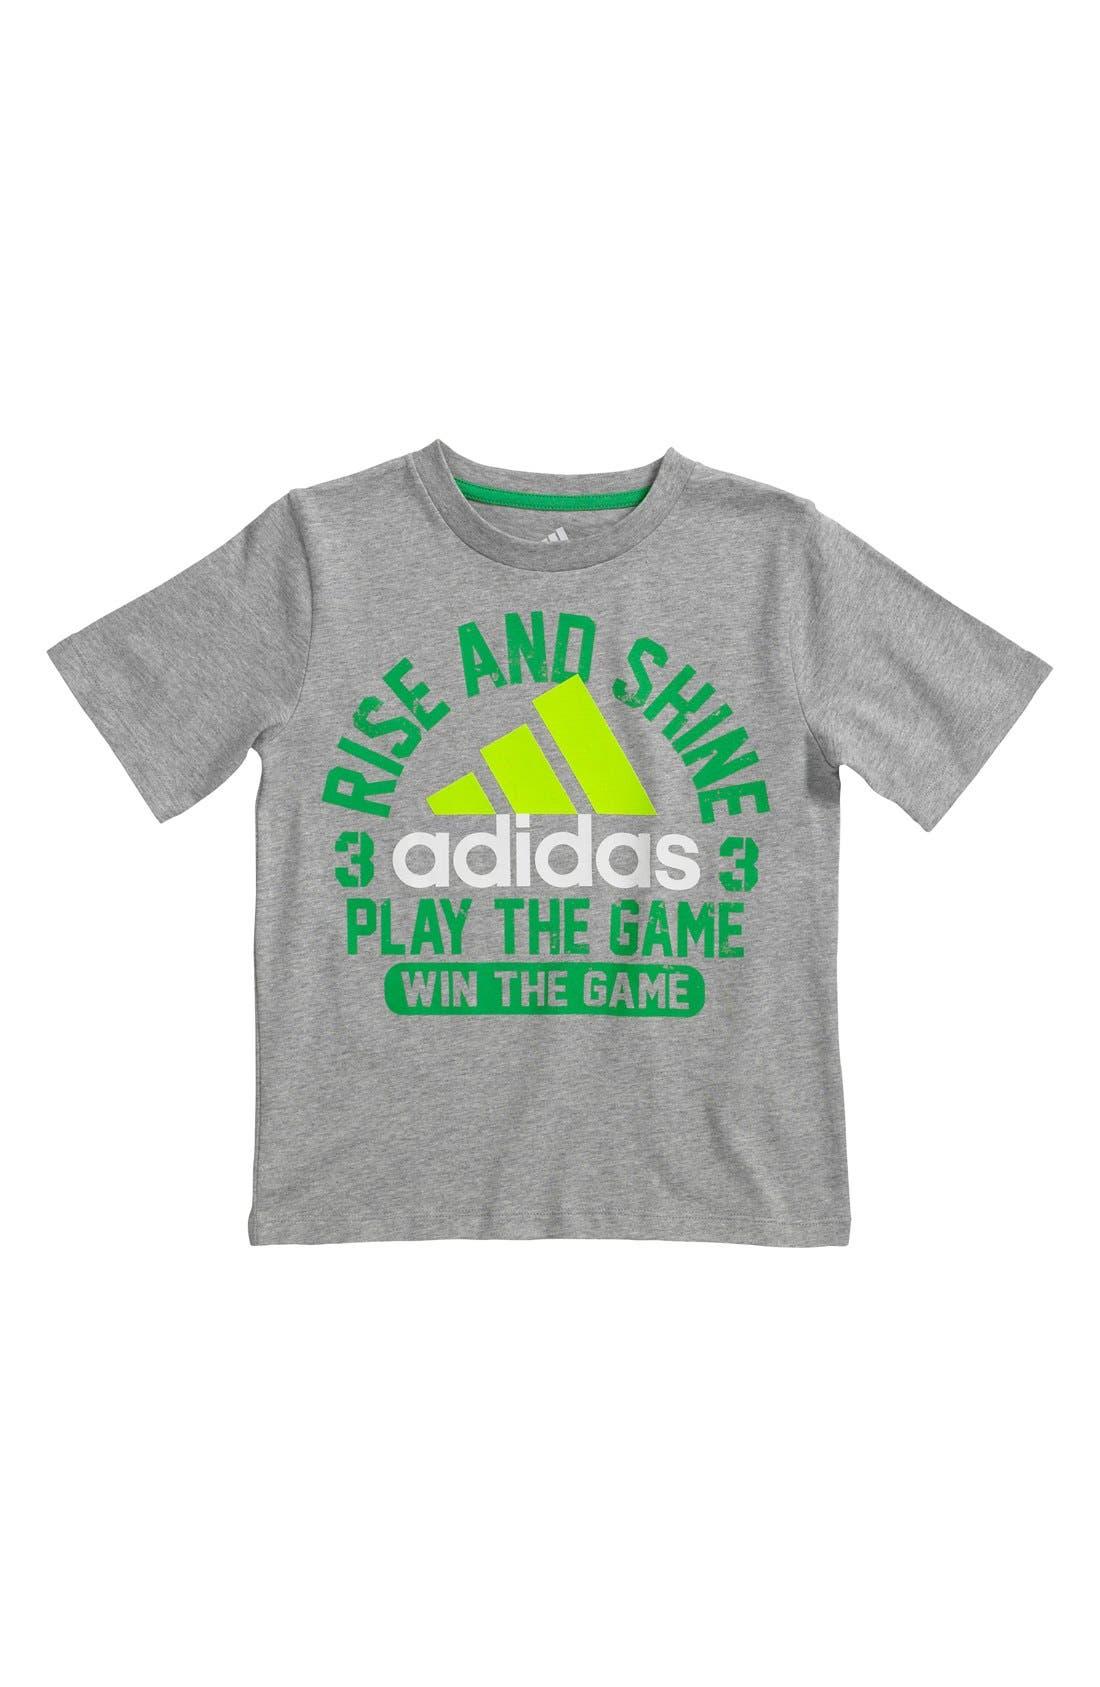 Alternate Image 1 Selected - adidas 'Rise & Shine' Screenprint Cotton Jersey T-Shirt (Toddler Boys)